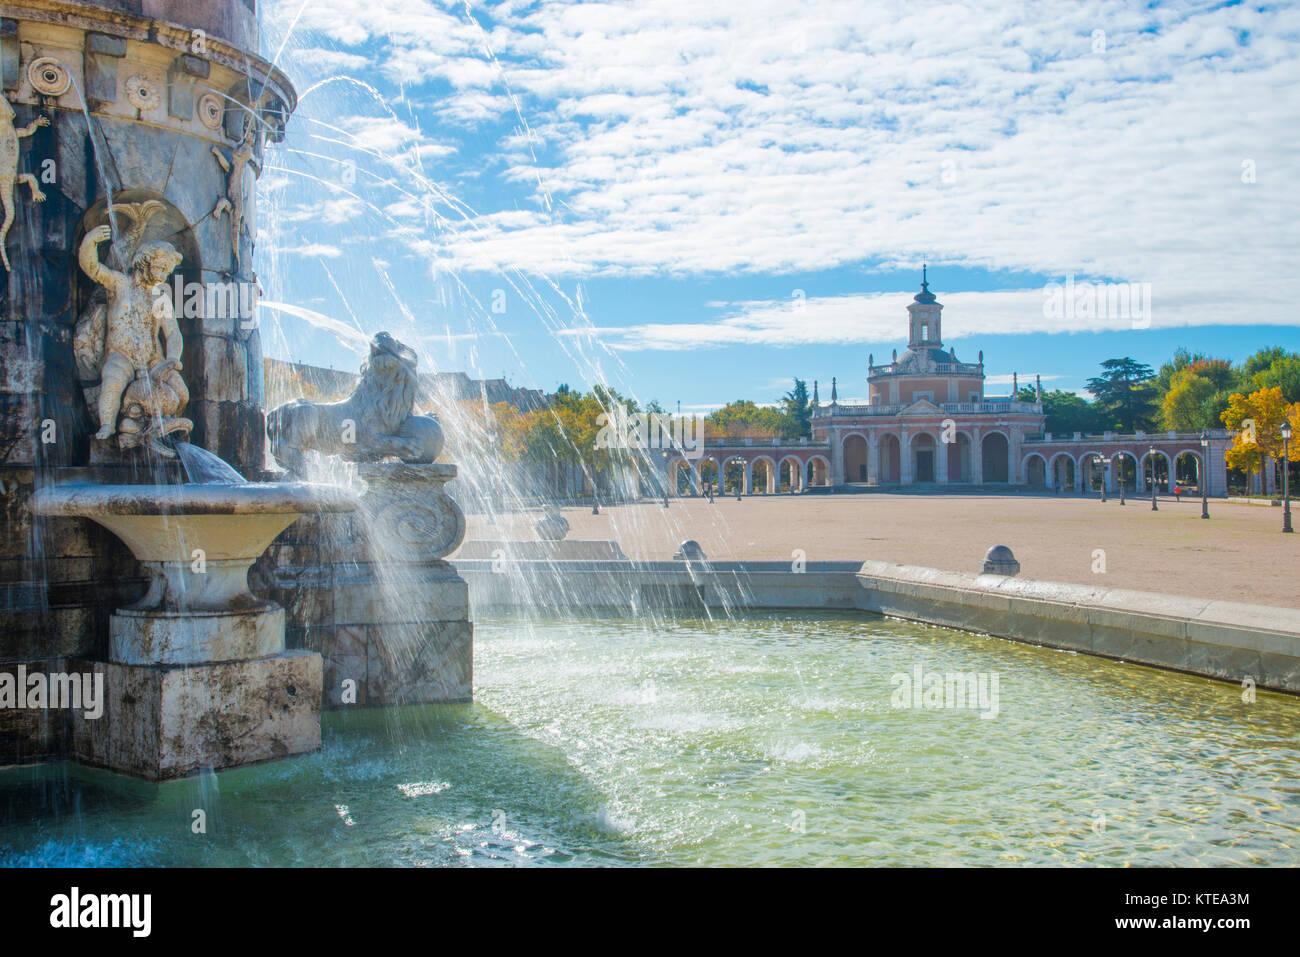 Fountain and San Antonio church. Aranjuez, Madrid province, Spain. - Stock Image